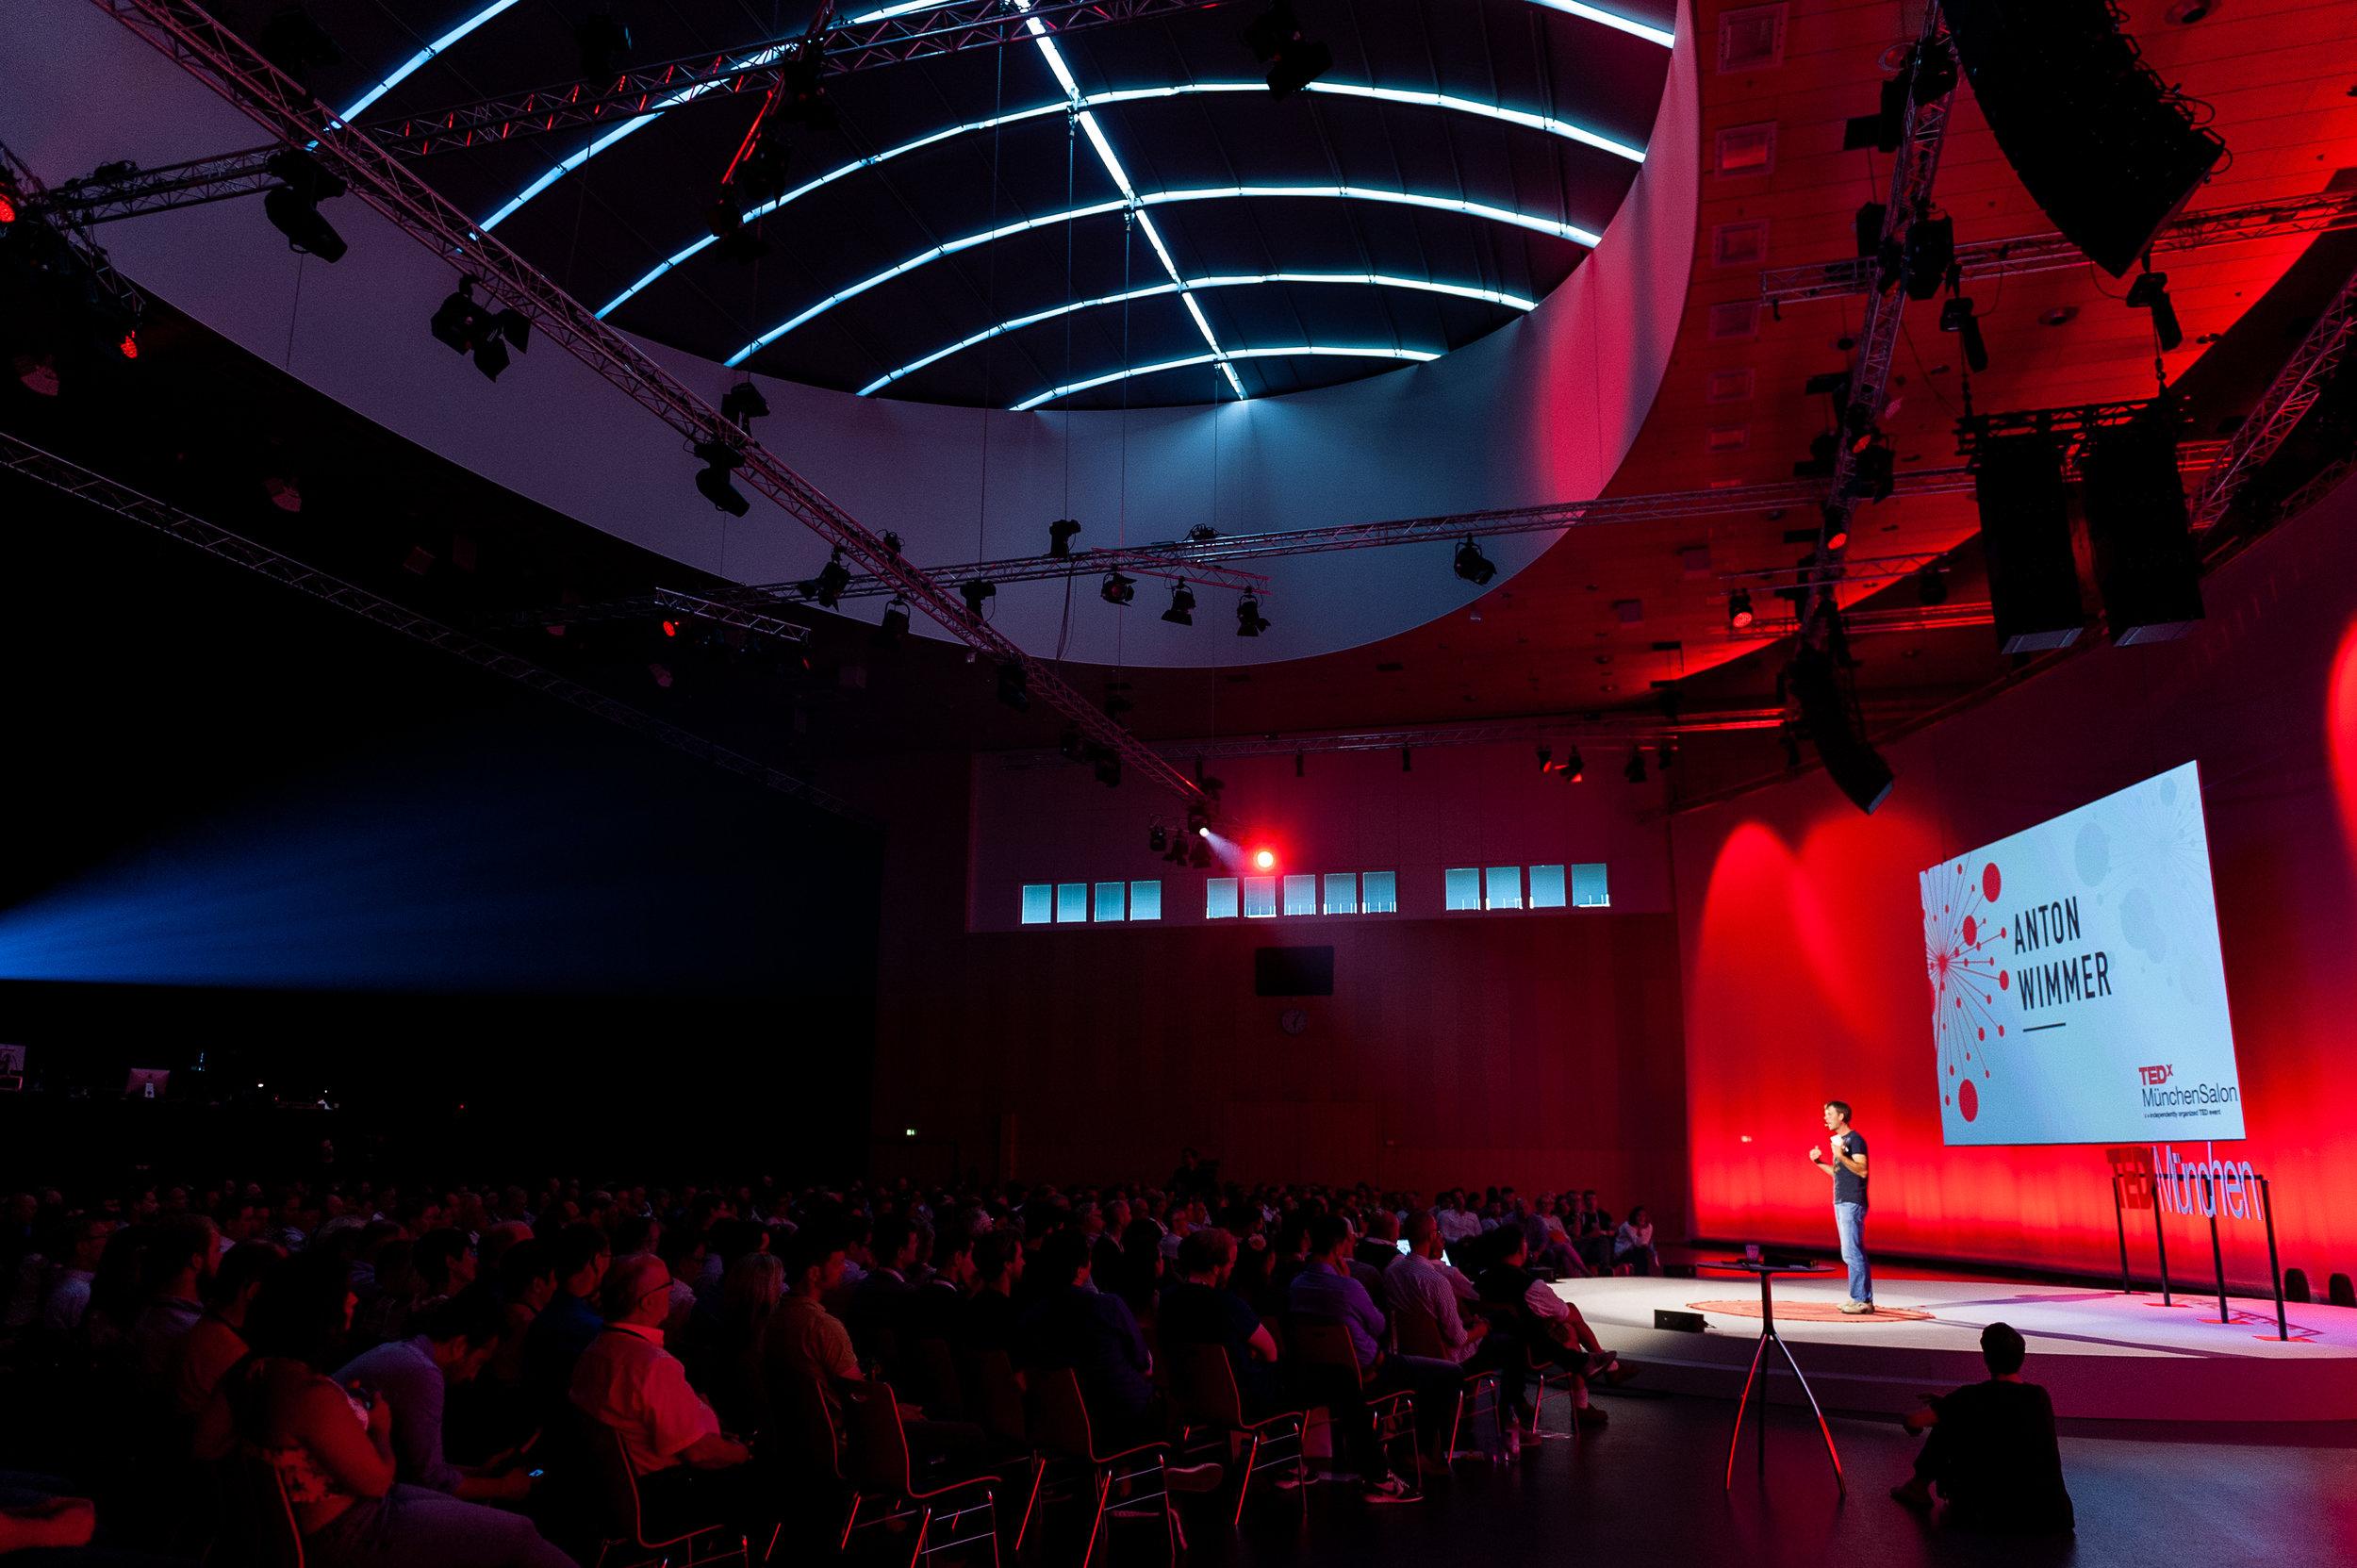 TEDx_MACH-180605-027.jpg